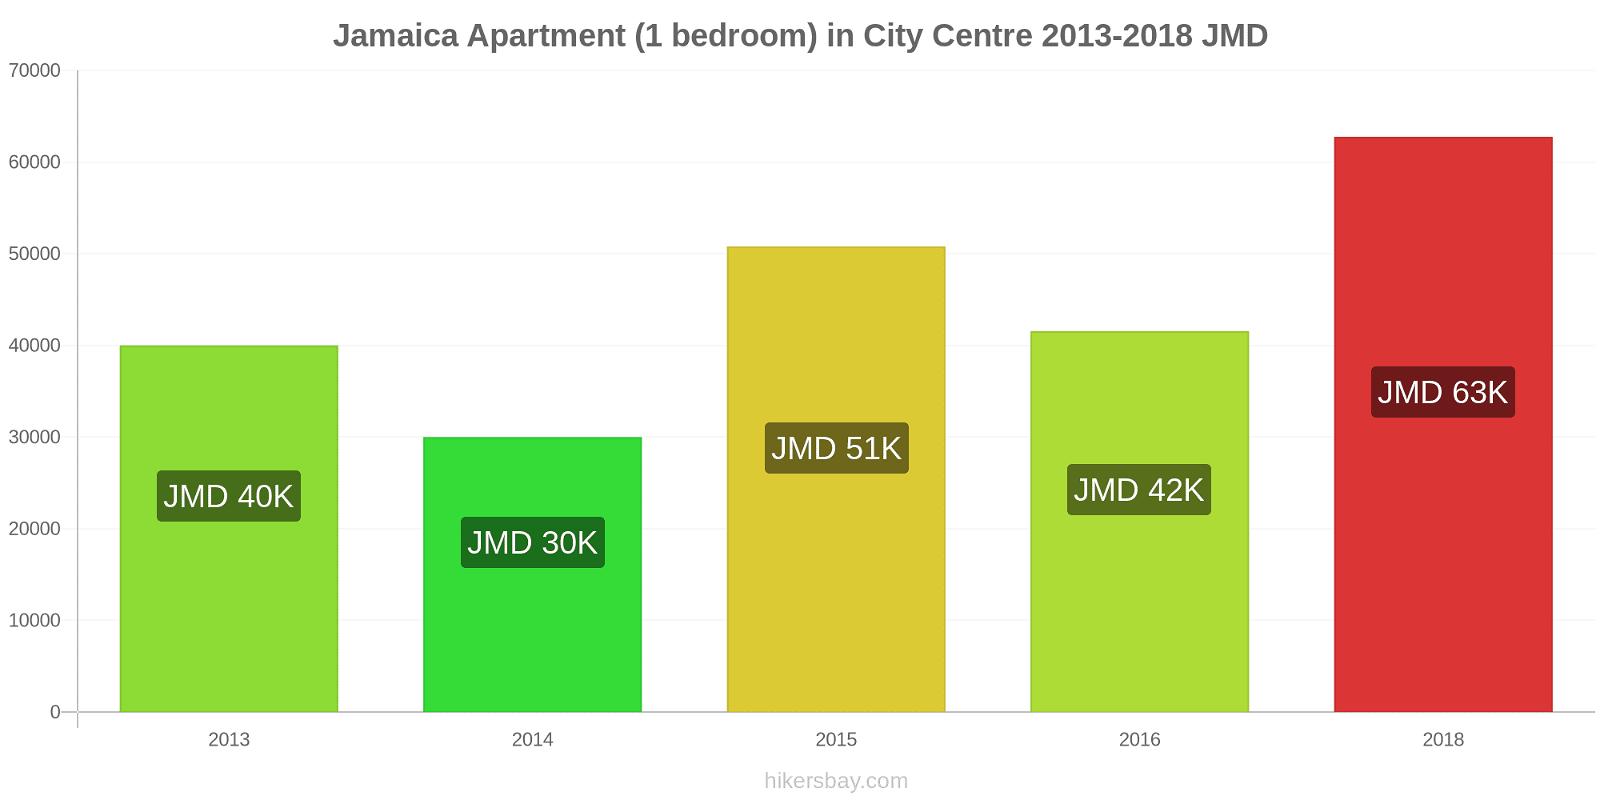 Jamaica price changes Apartment (1 bedroom) in City Centre hikersbay.com